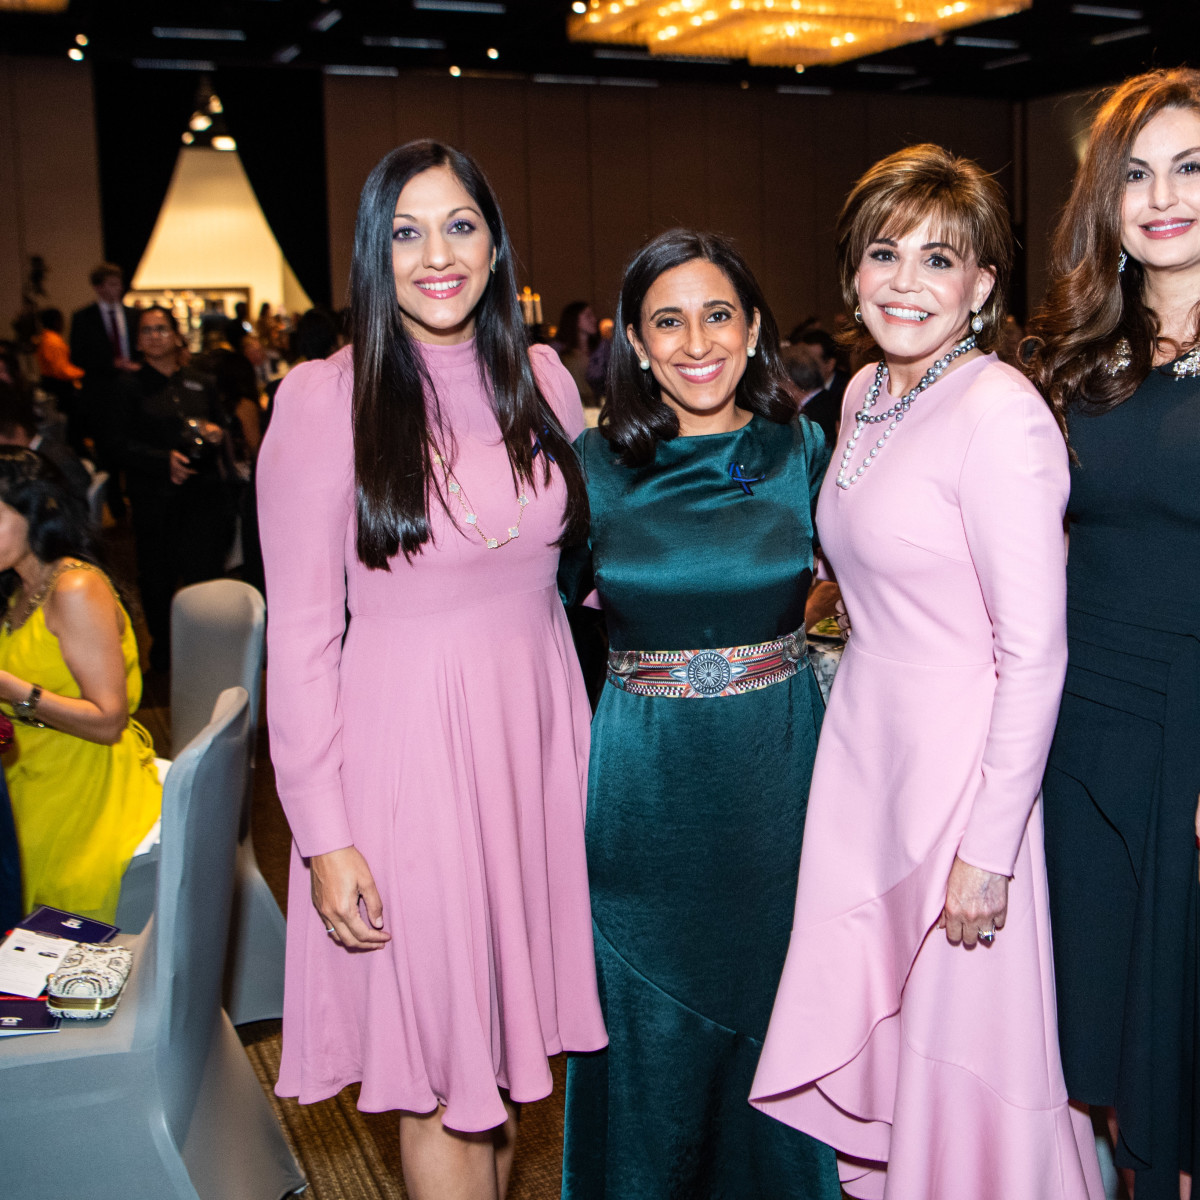 Crime Stoppers Gala 2019 Sippi Khurana, Rania Mankarious, Hallie Vanderhider, Brigitte Kalai